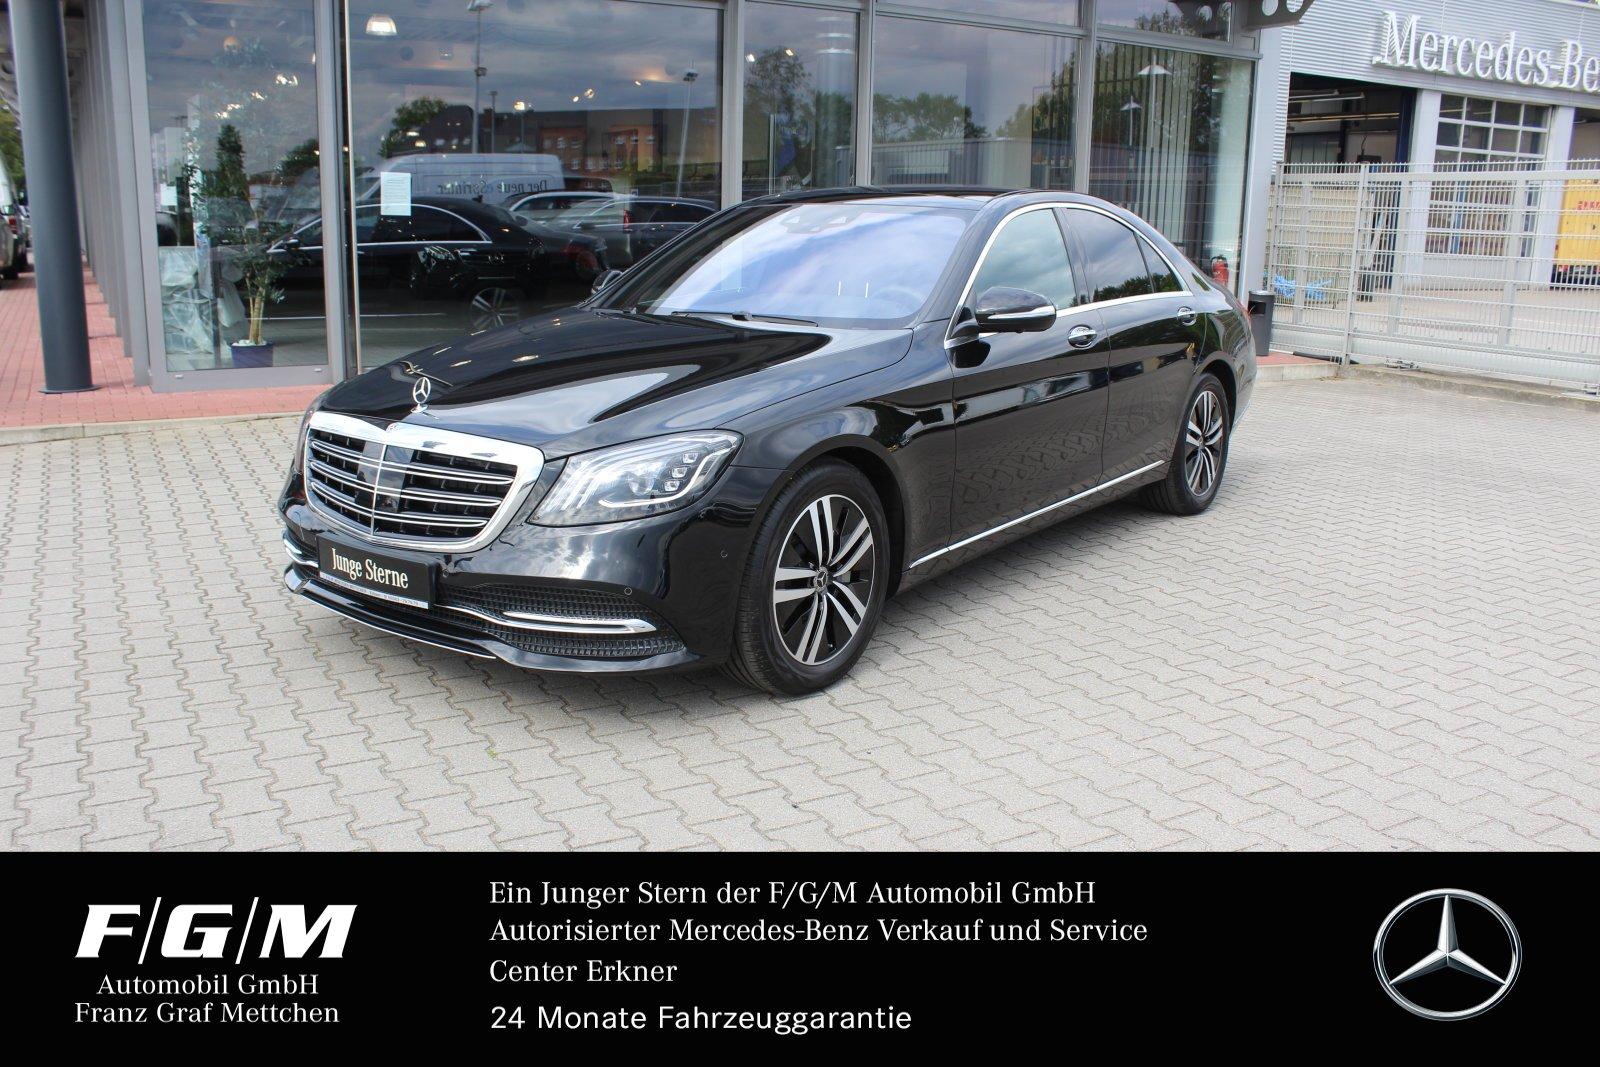 Mercedes-Benz S 450 4M COM/ILS/PanoD/HUD/Distr/KeyGo/360°/DAB, Jahr 2018, Benzin